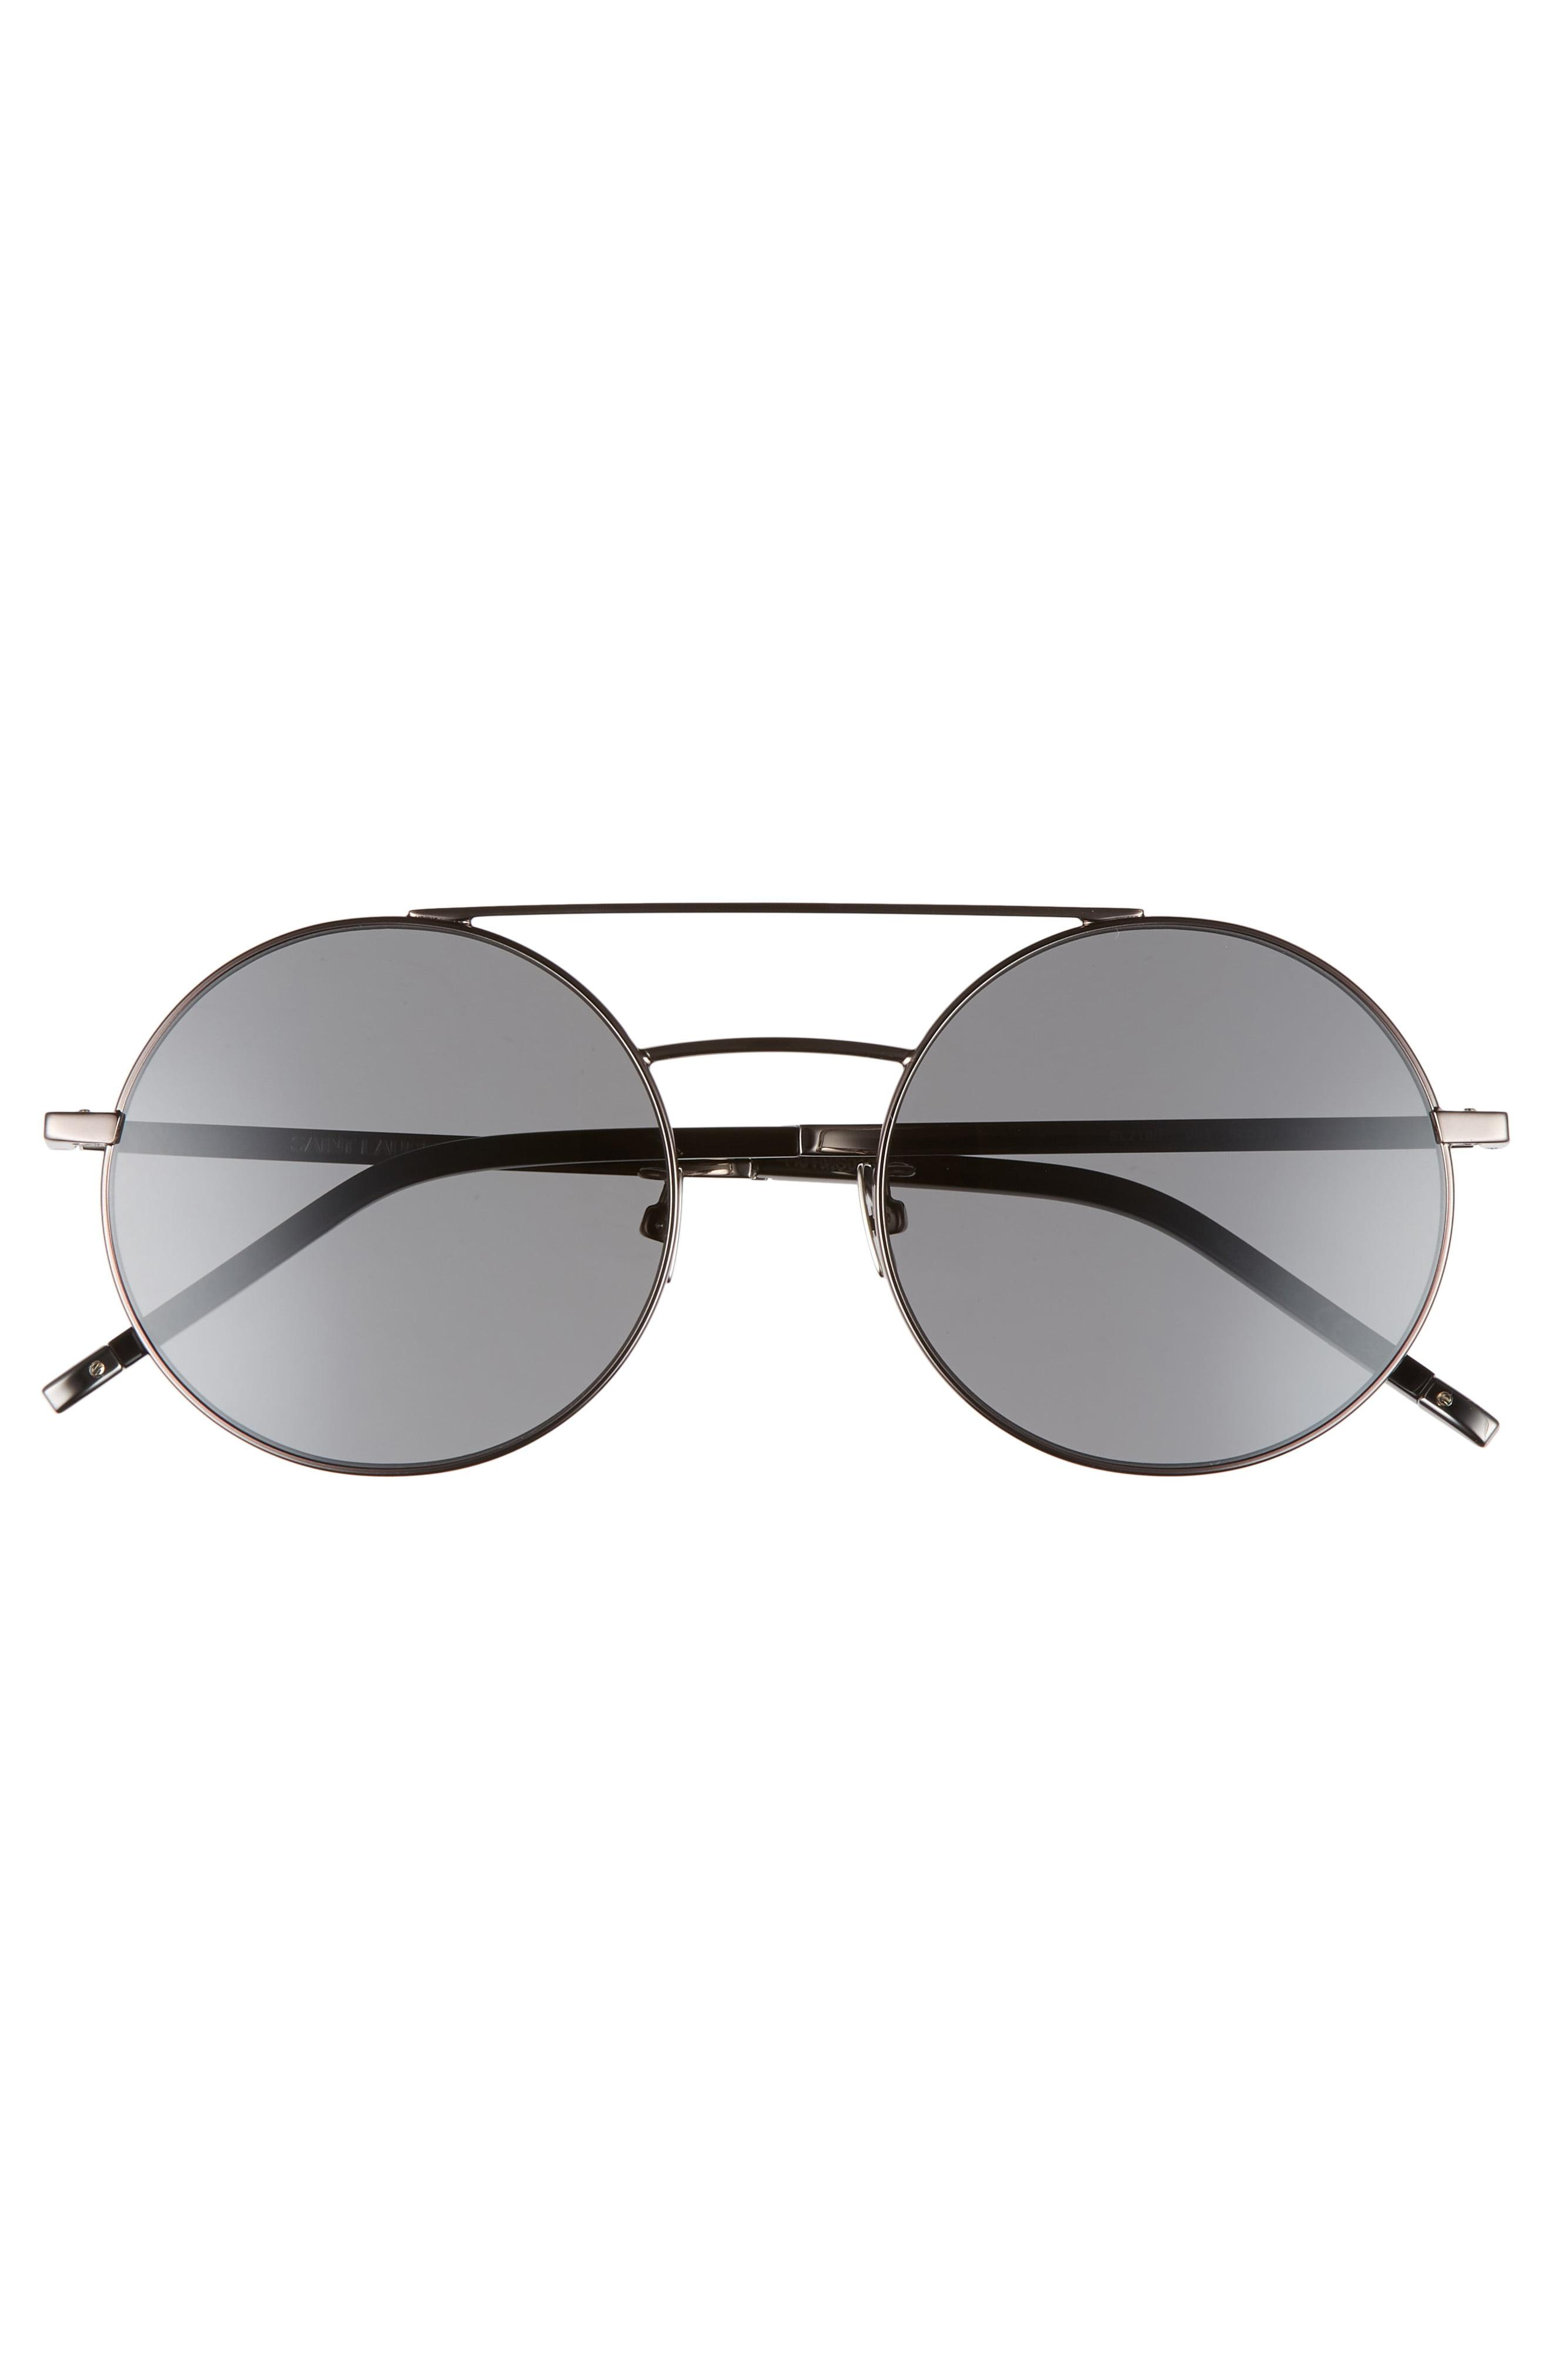 2002a5895a489 Saint Laurent Sl 210 f 56mm Round Aviator Sunglasses - Dark ...